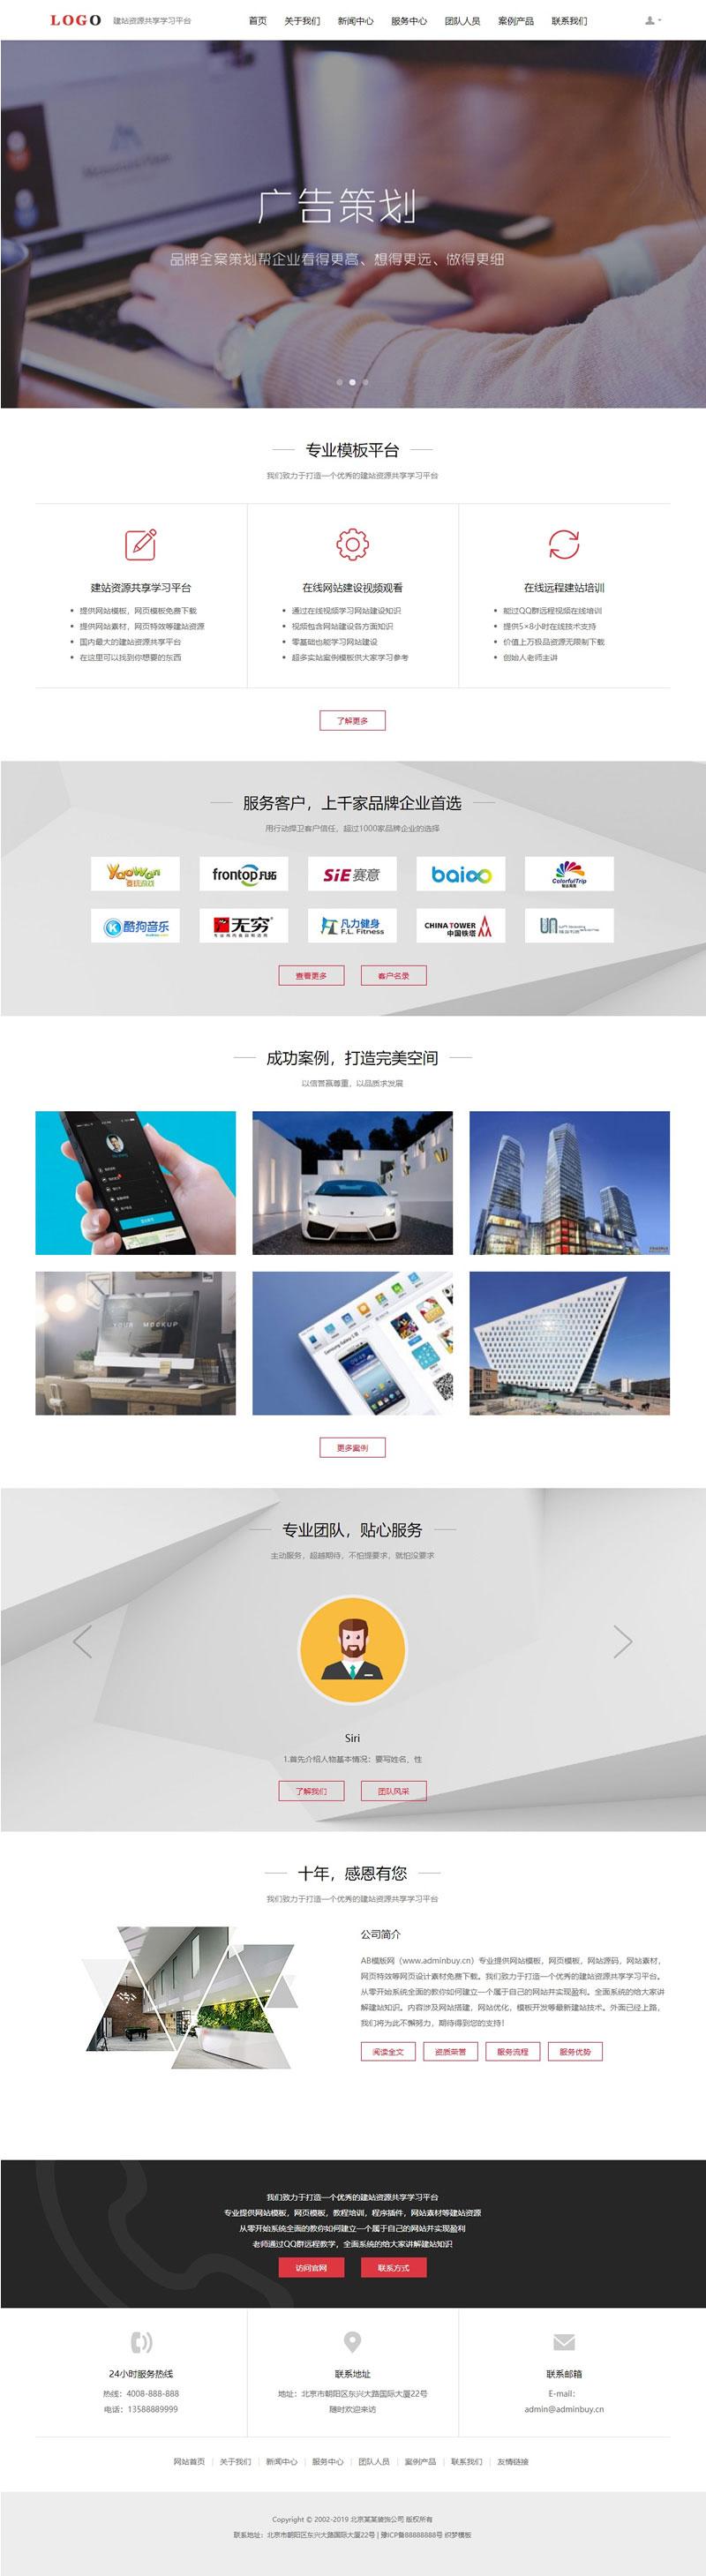 【dedecms】自适应WAP网络建站广告设计公司织梦dedecms网站模板-爱资源分享